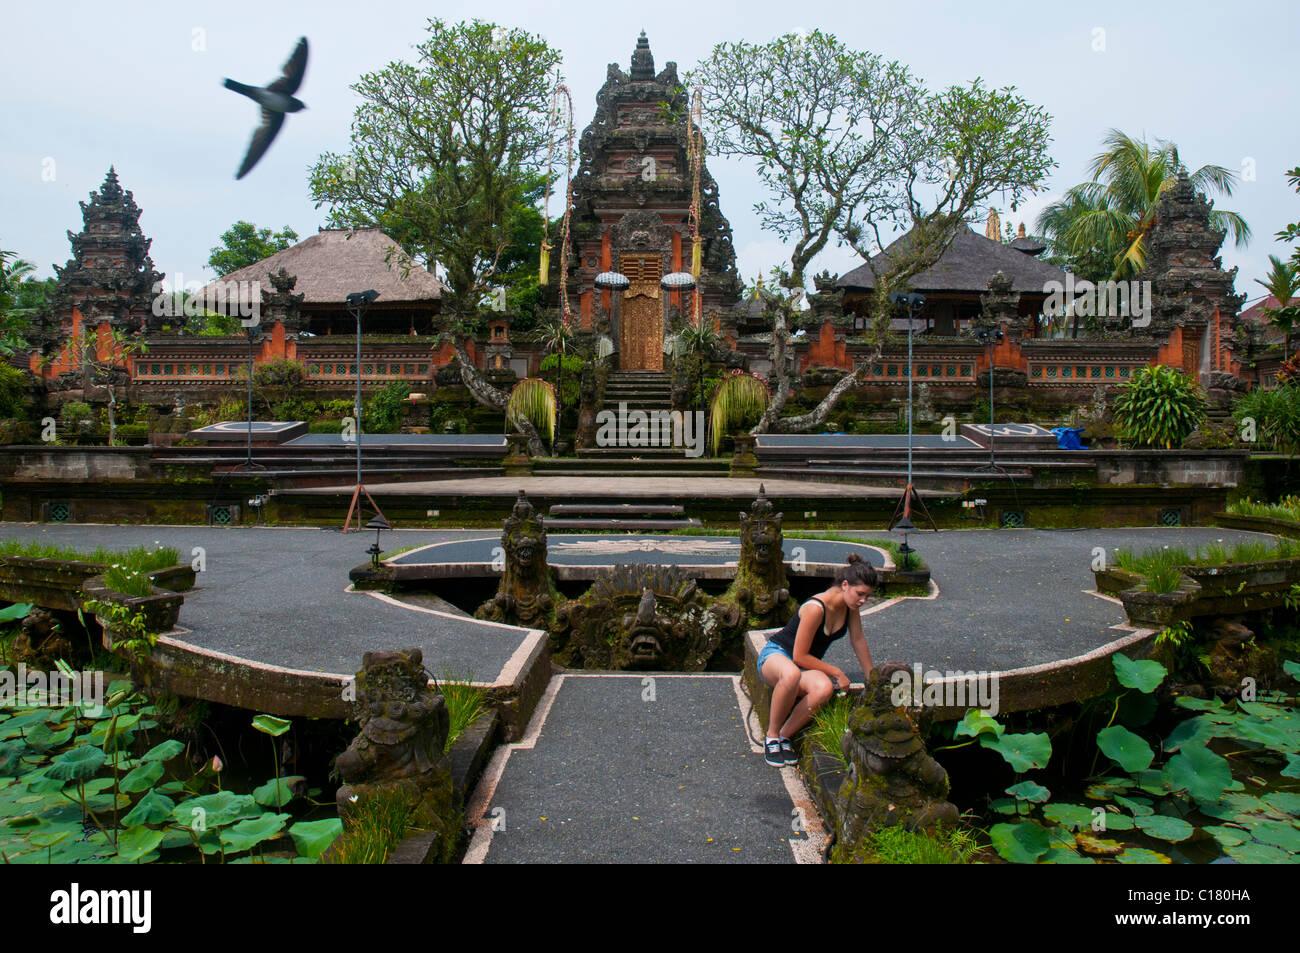 Pura Taman Saraswati Ubud Bali Indonesia - Stock Image